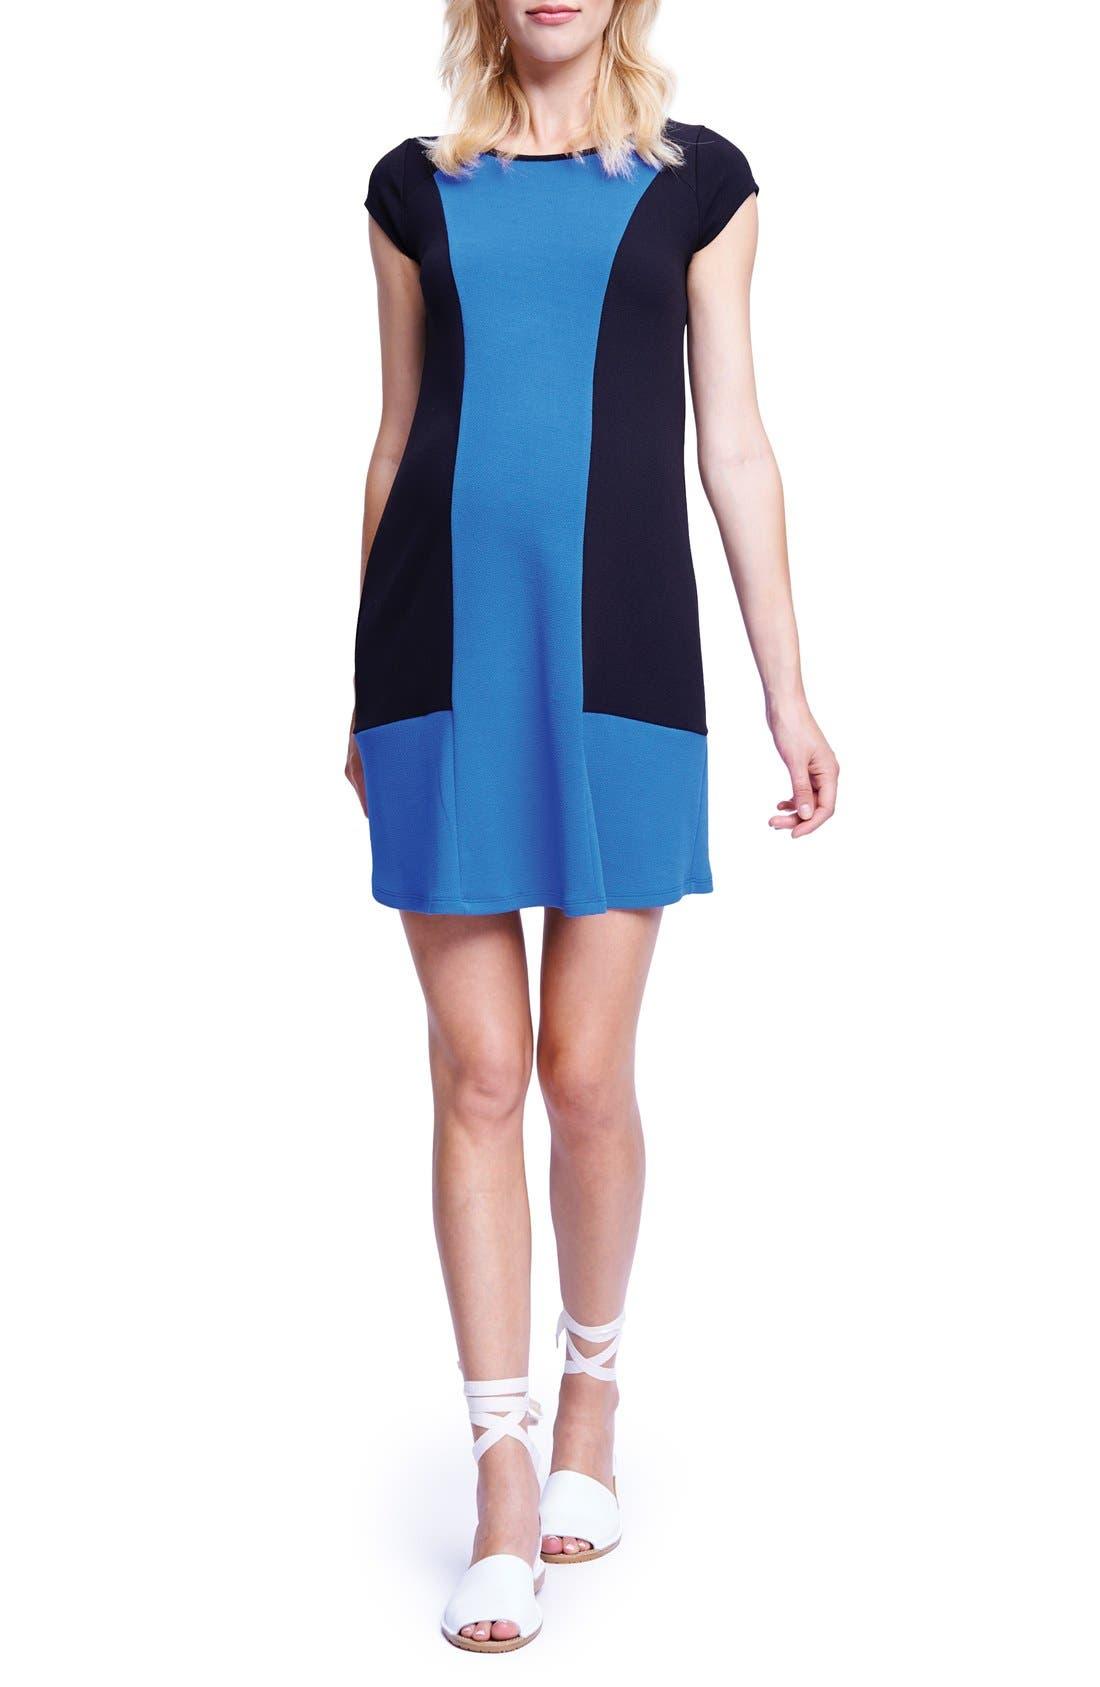 Colorblock Maternity T-Shirt Dress,                             Main thumbnail 1, color,                             BLACK/ ROYAL BLUE